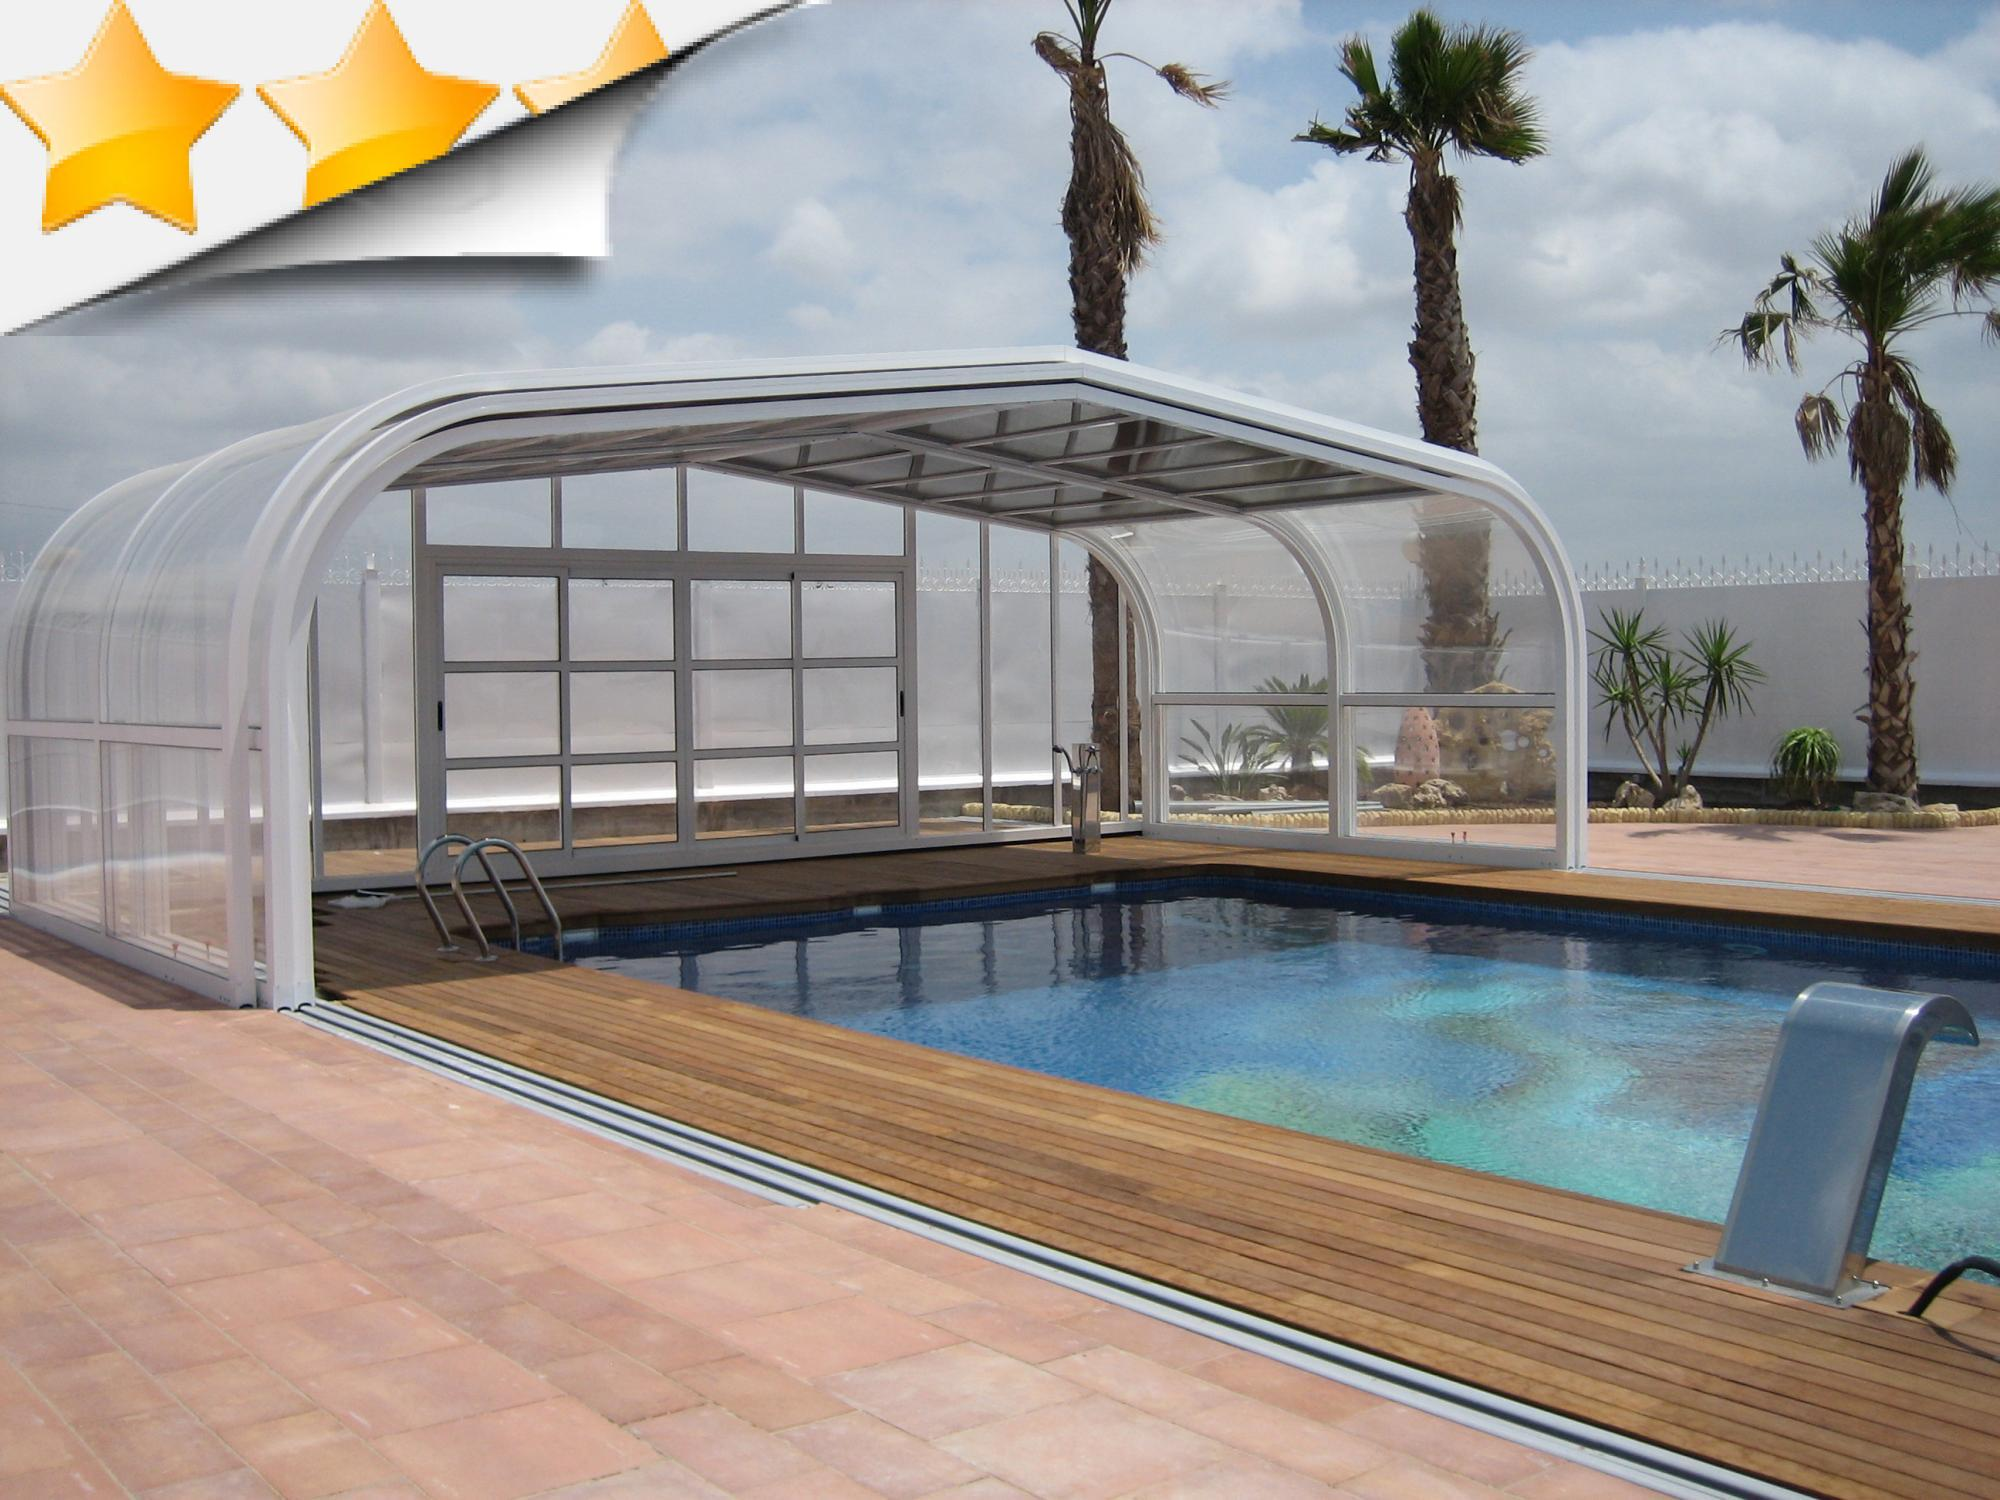 Abri piscine t lescopique vsun s curit par lpc for Accessoires piscine 04